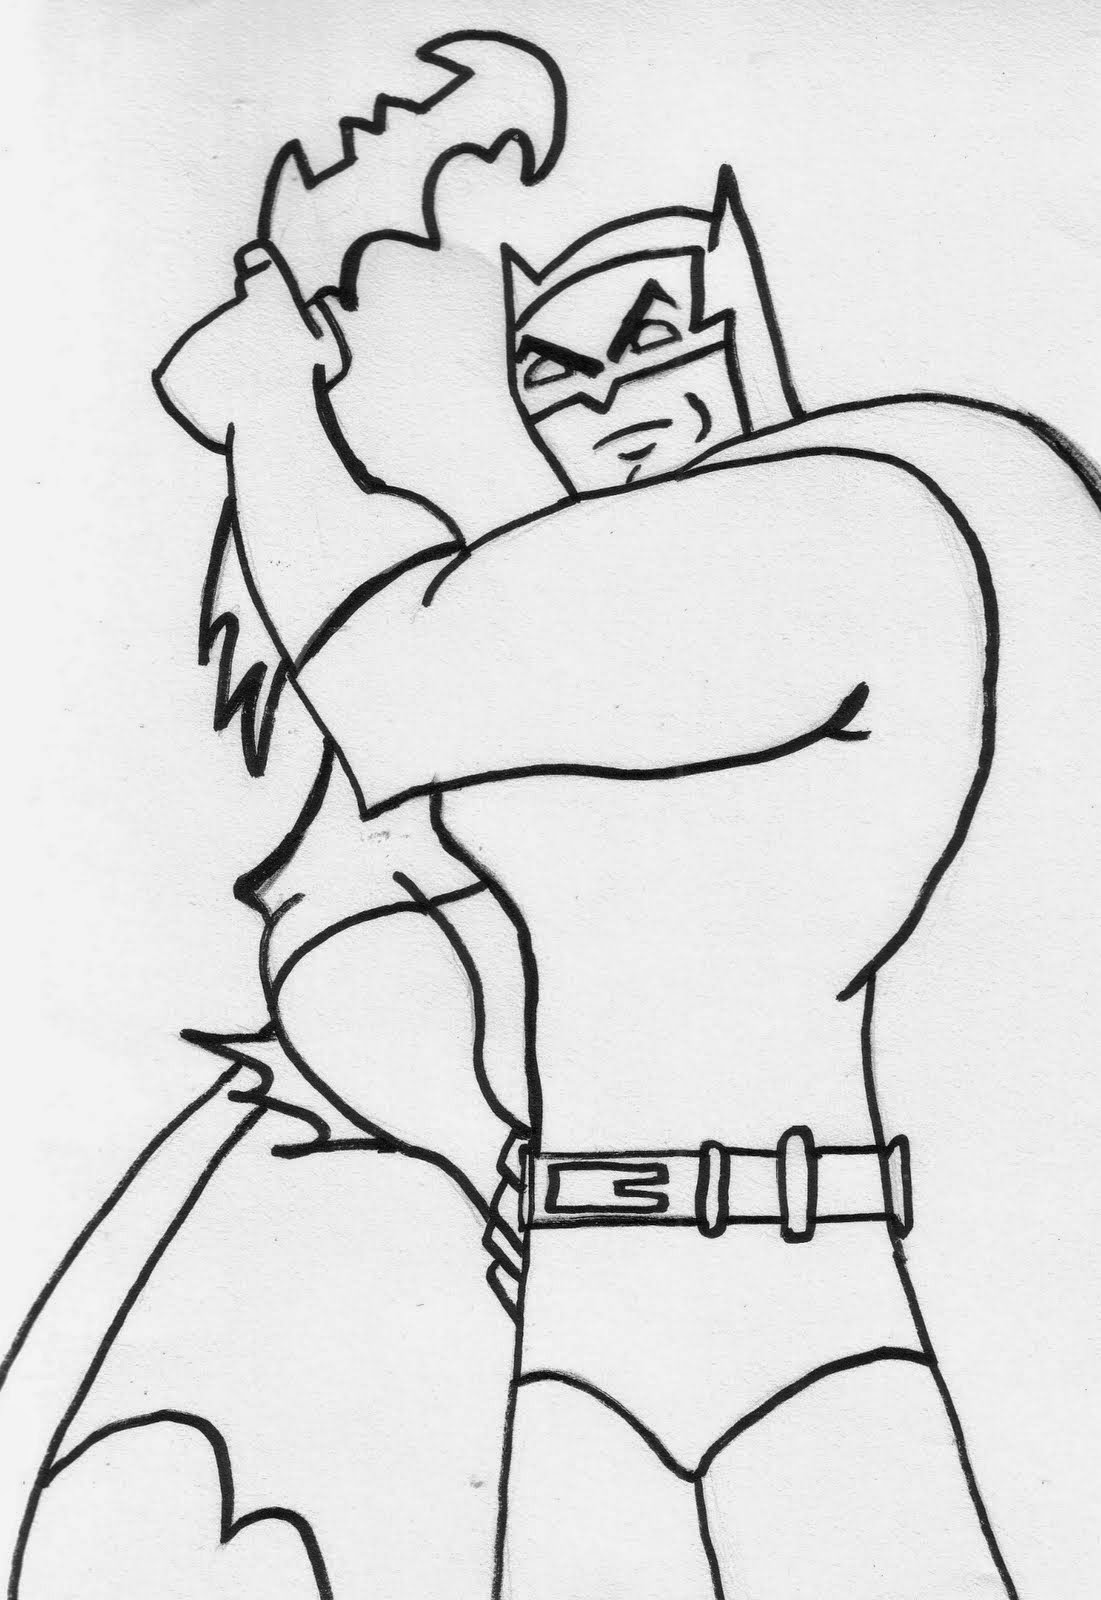 free printable batman coloring pages - photo#26